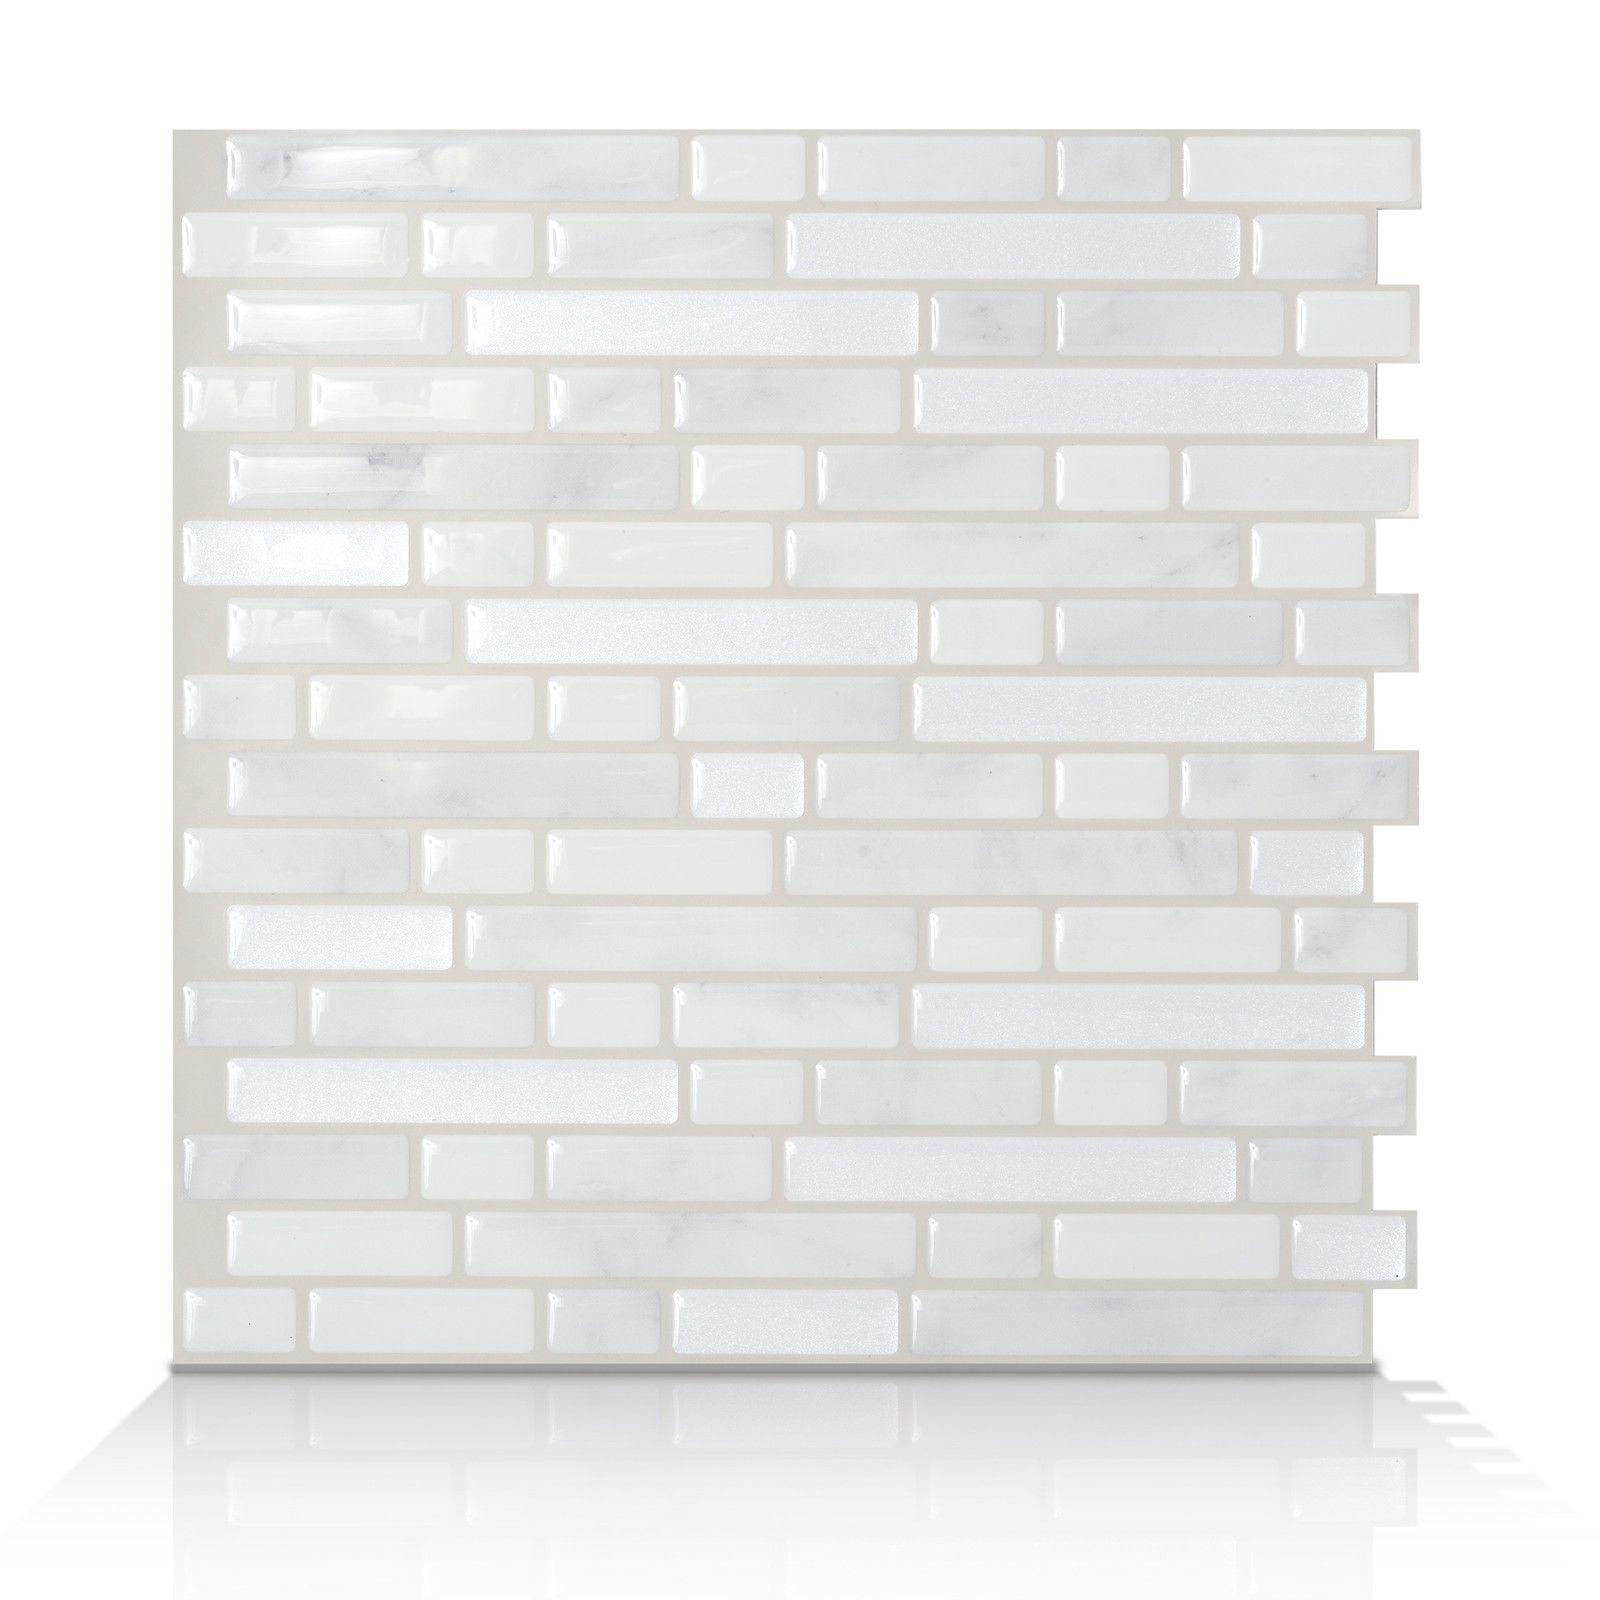 SMART TILES / Peel 'n Stick Wall Tiles / $57[1]